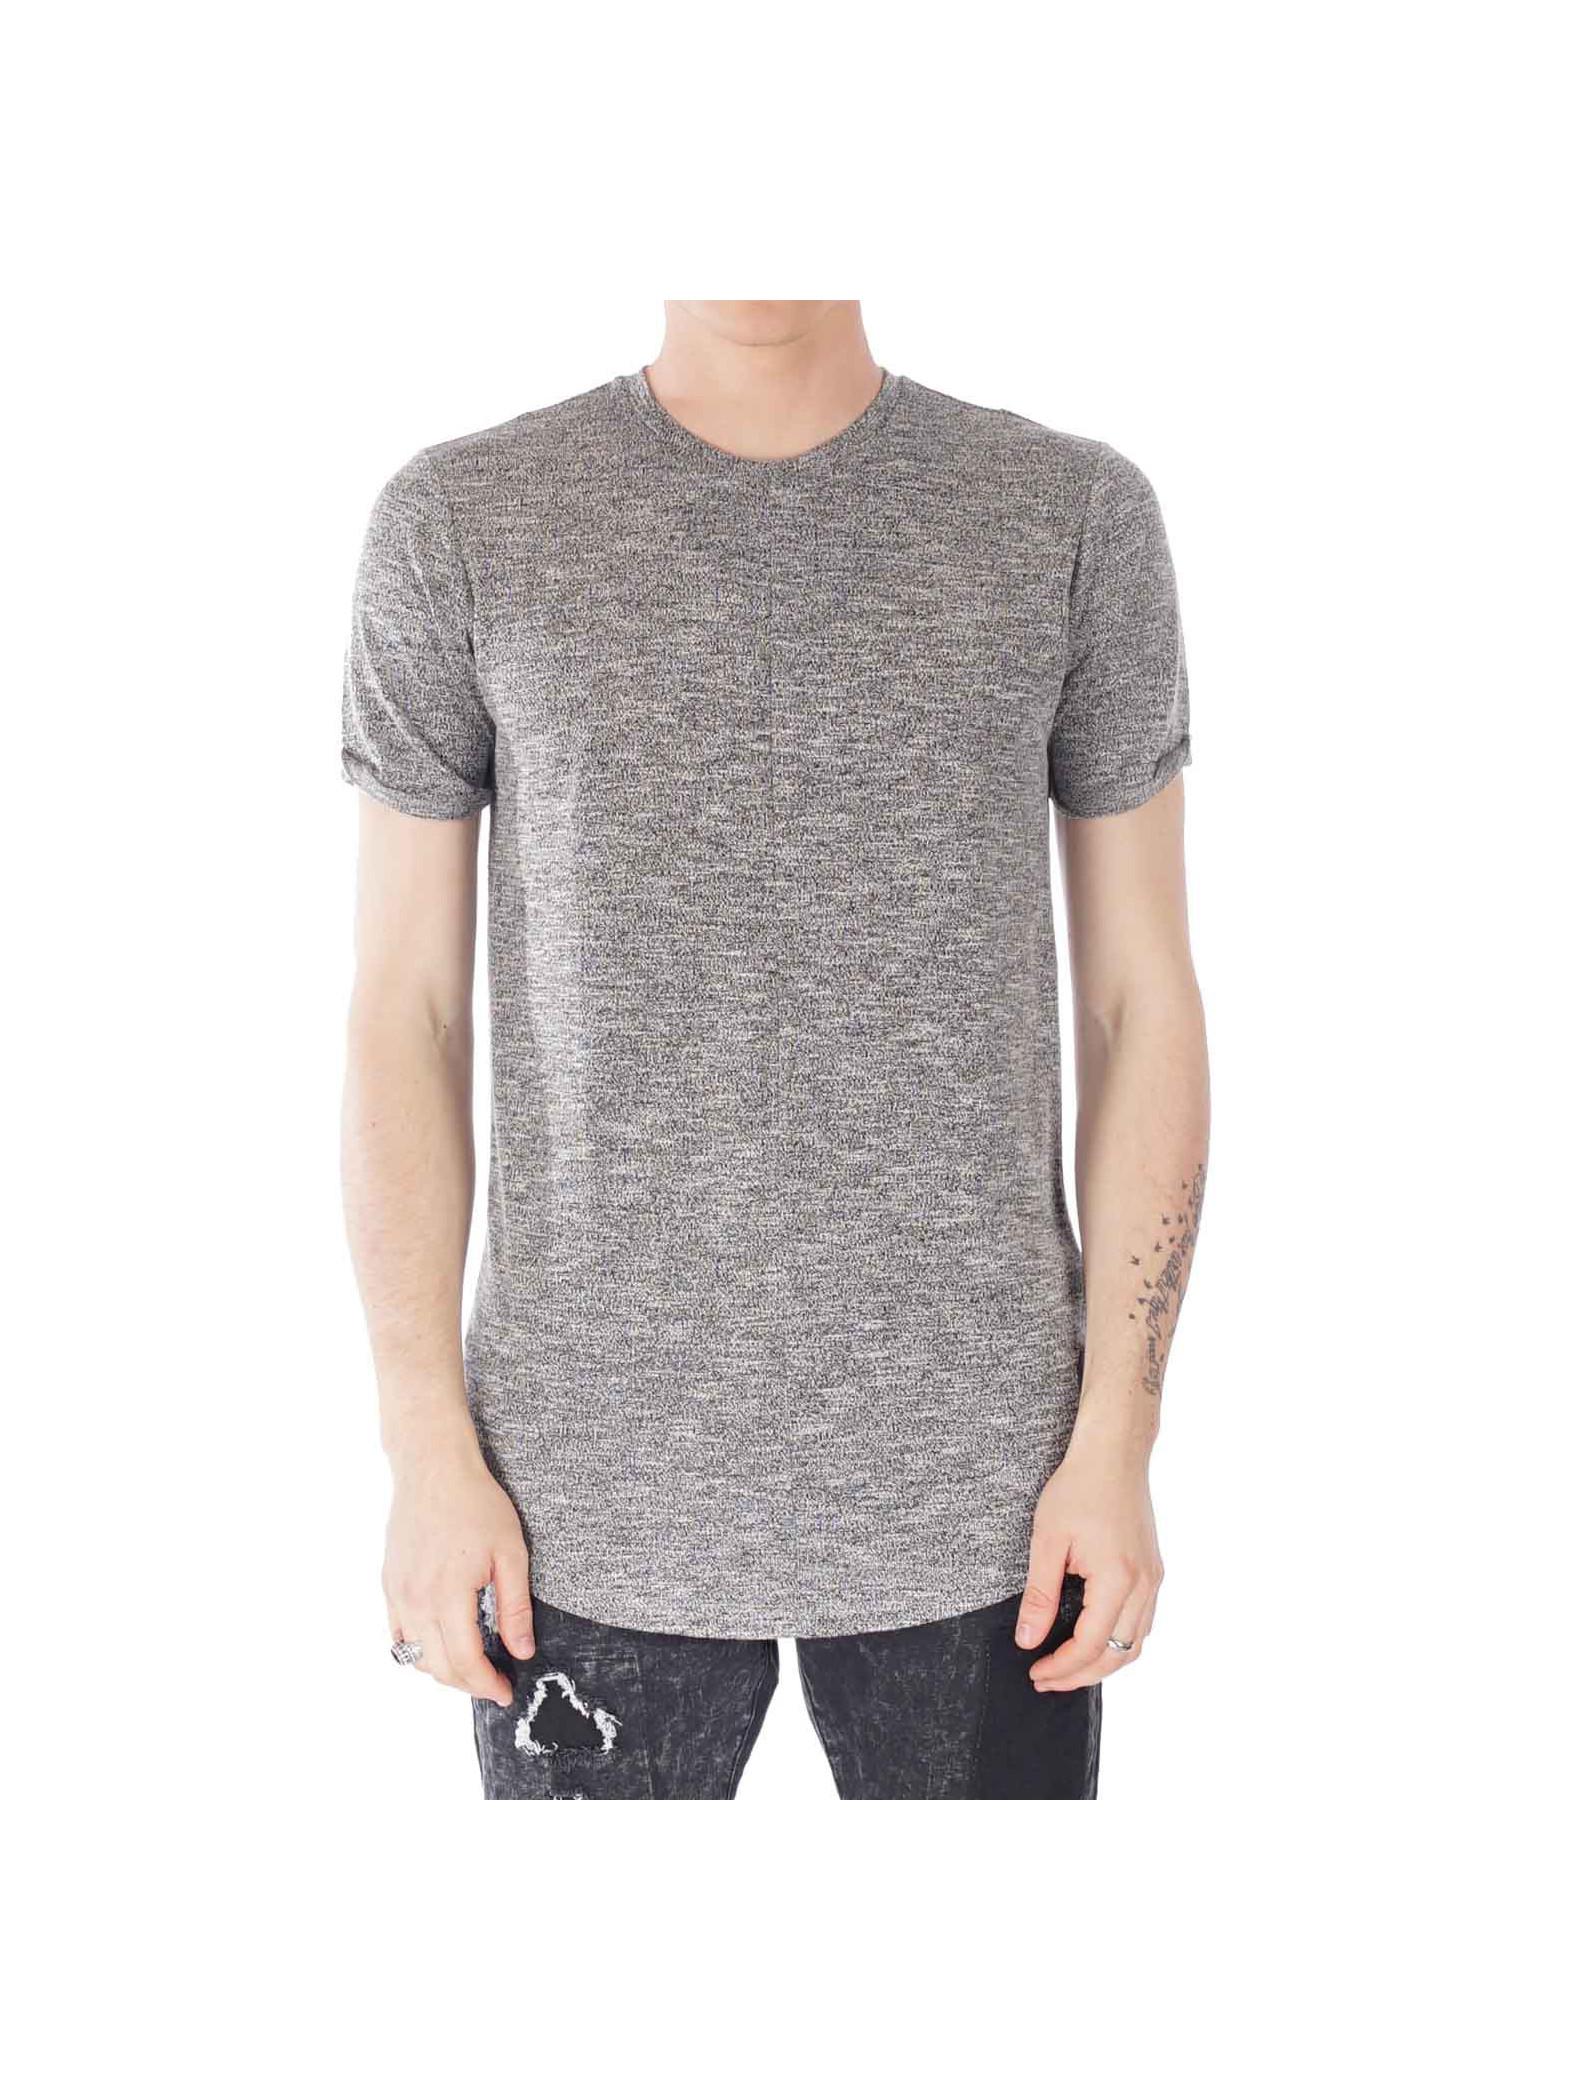 cotton blend oversized tee shirt project x paris 88161132. Black Bedroom Furniture Sets. Home Design Ideas